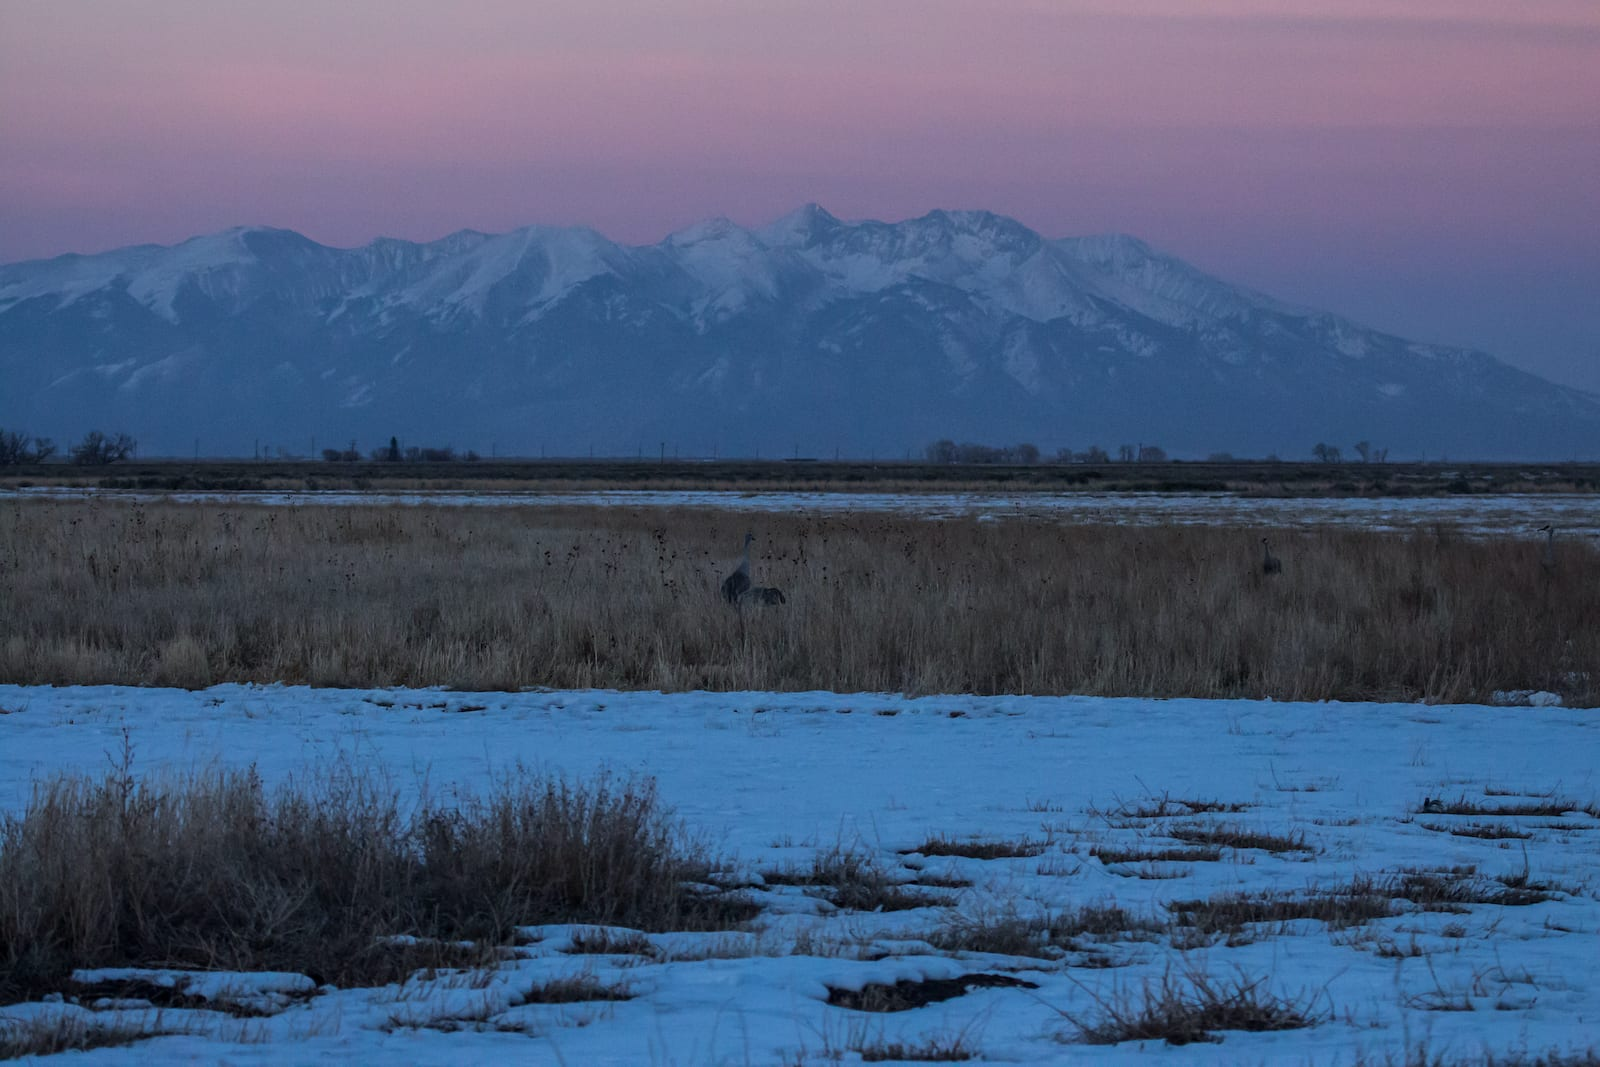 Monte Vista National Wildlife Refuge Sunset